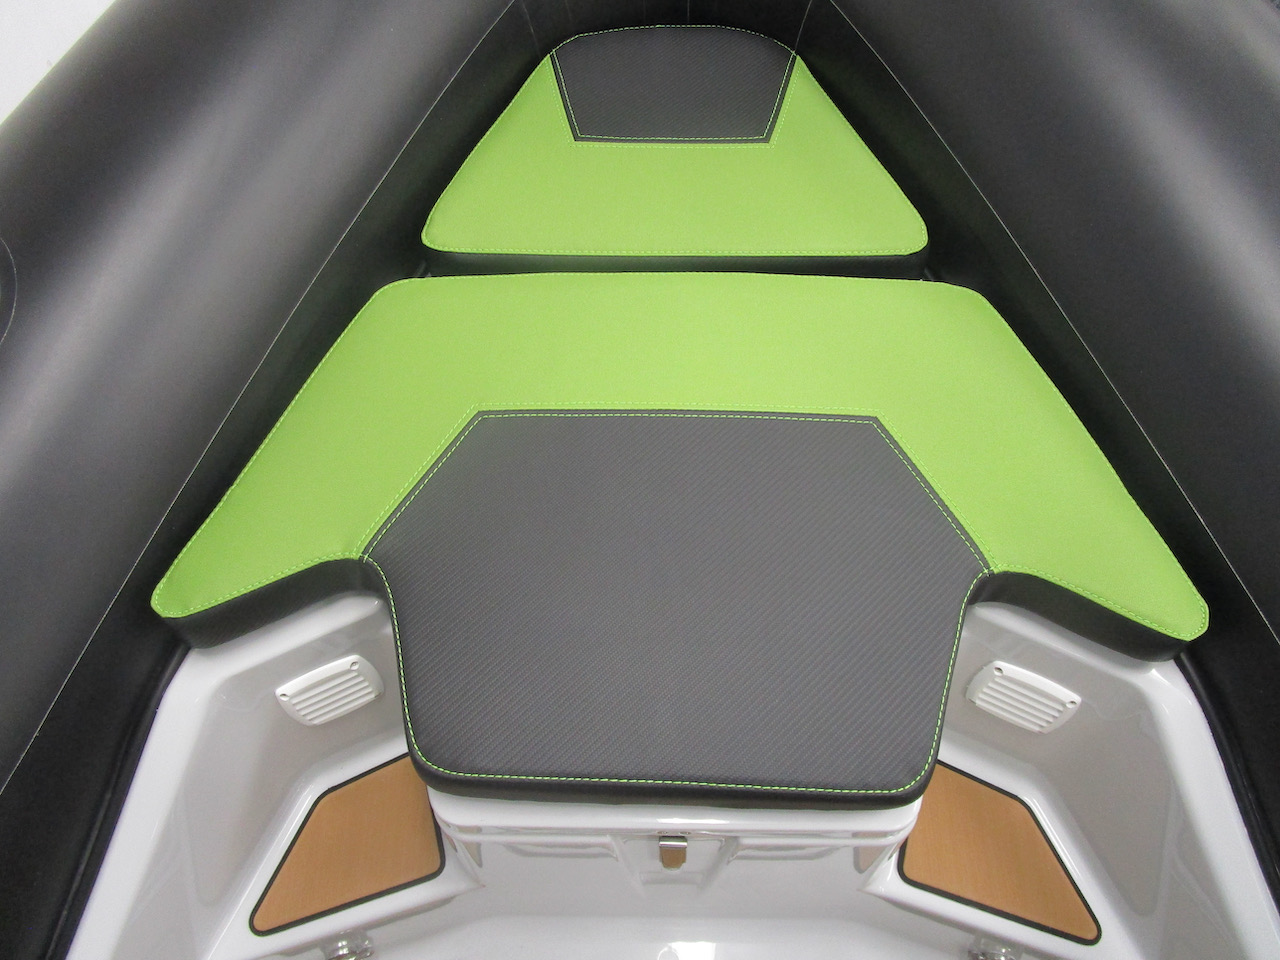 GRAND DRIVE D600 RIB bow cushions